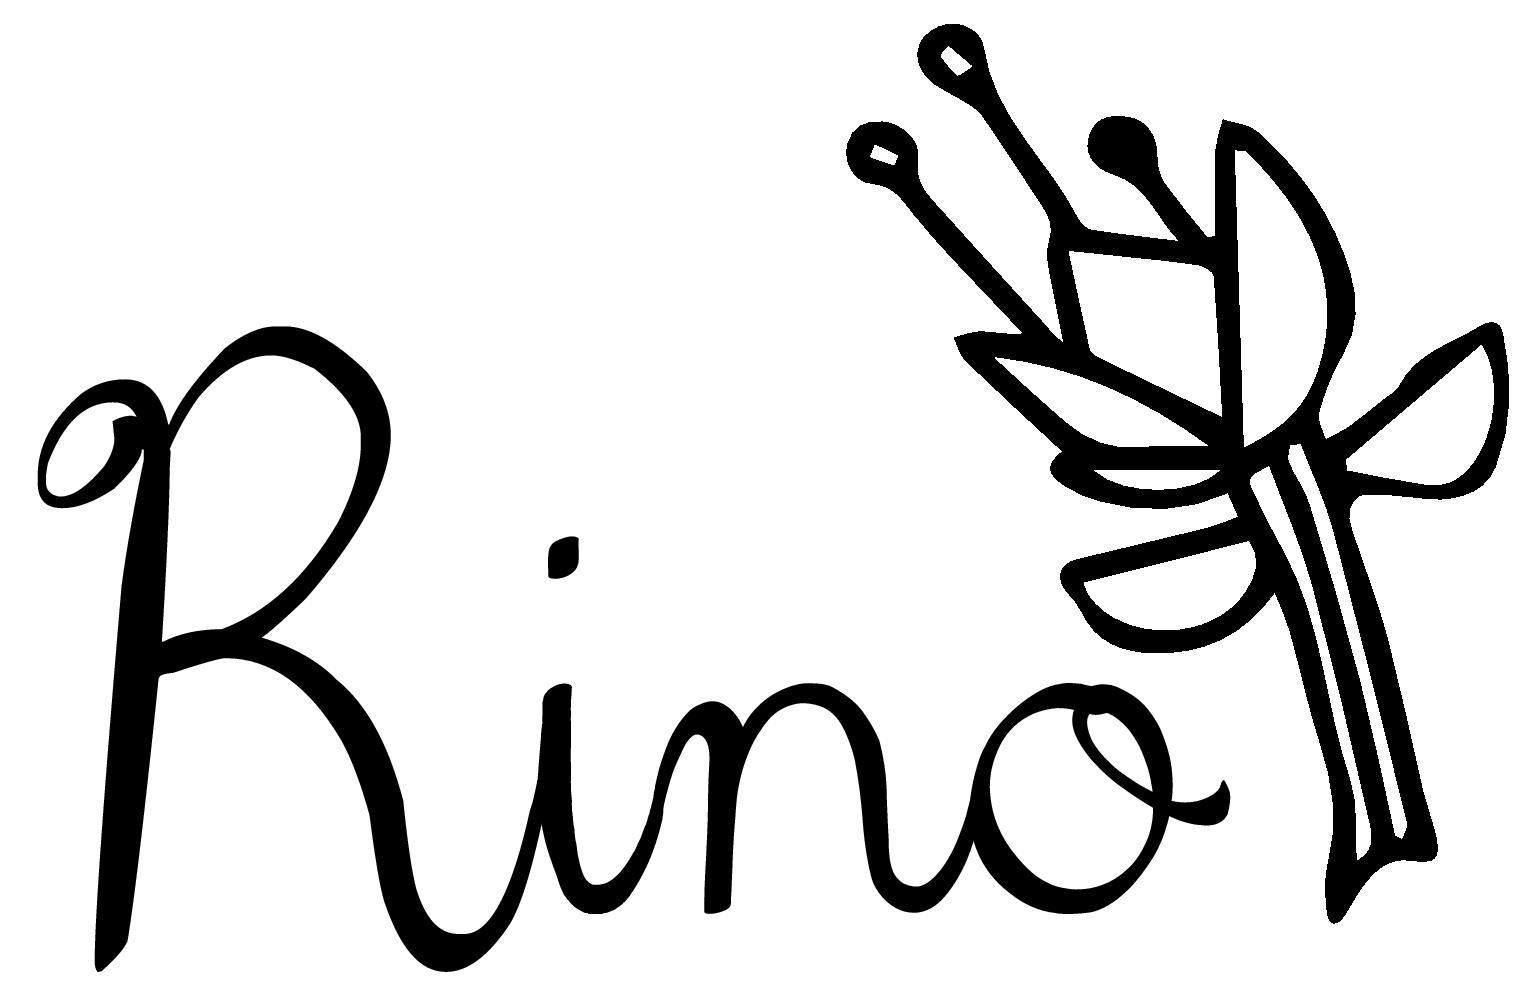 Butik Rino